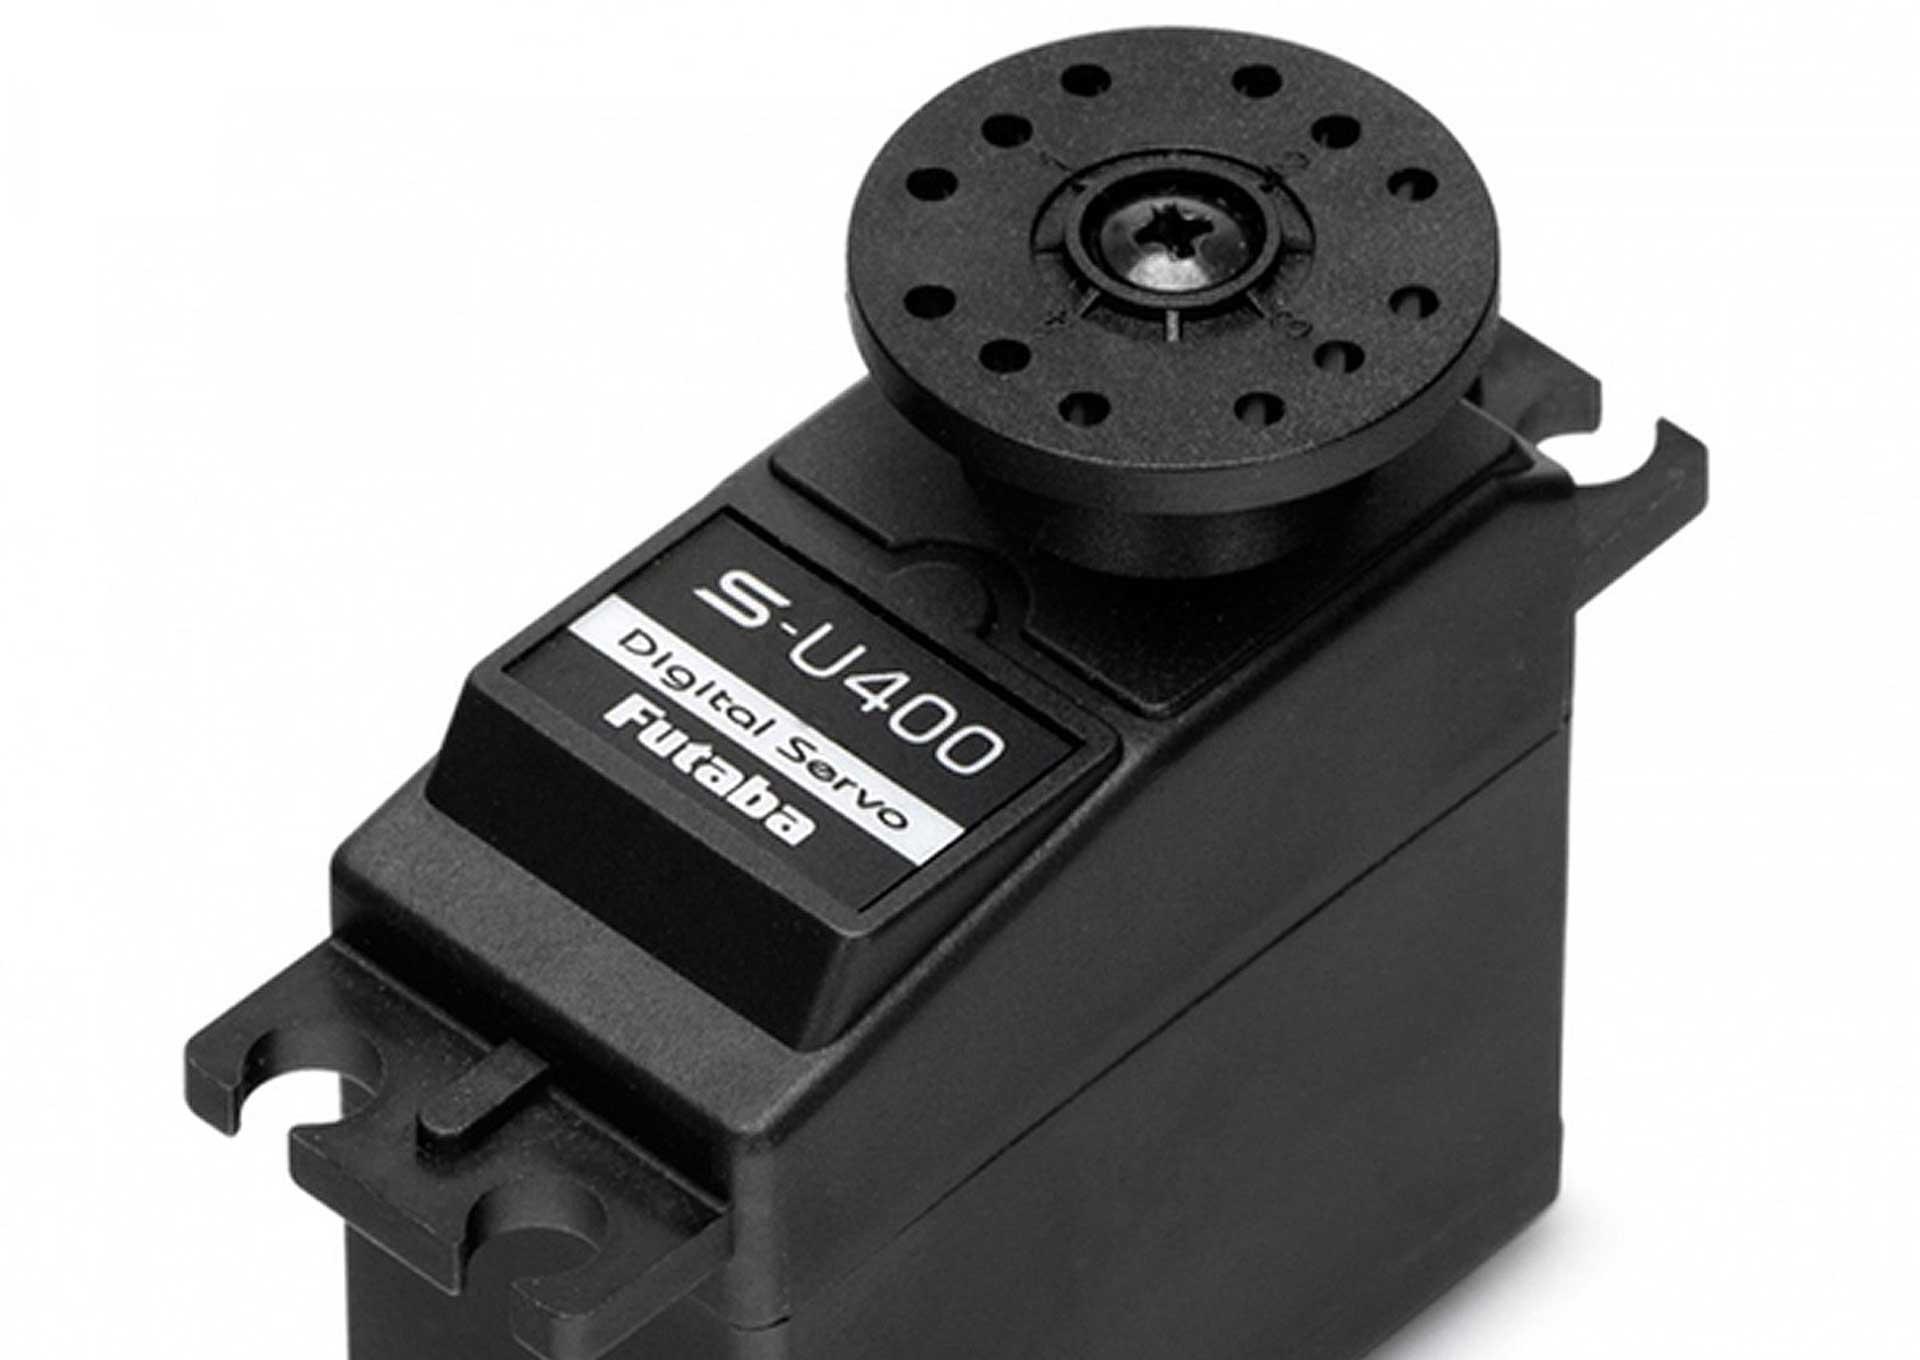 Futaba S-U400 Digital S.BUS2 0,14s/8,0kg